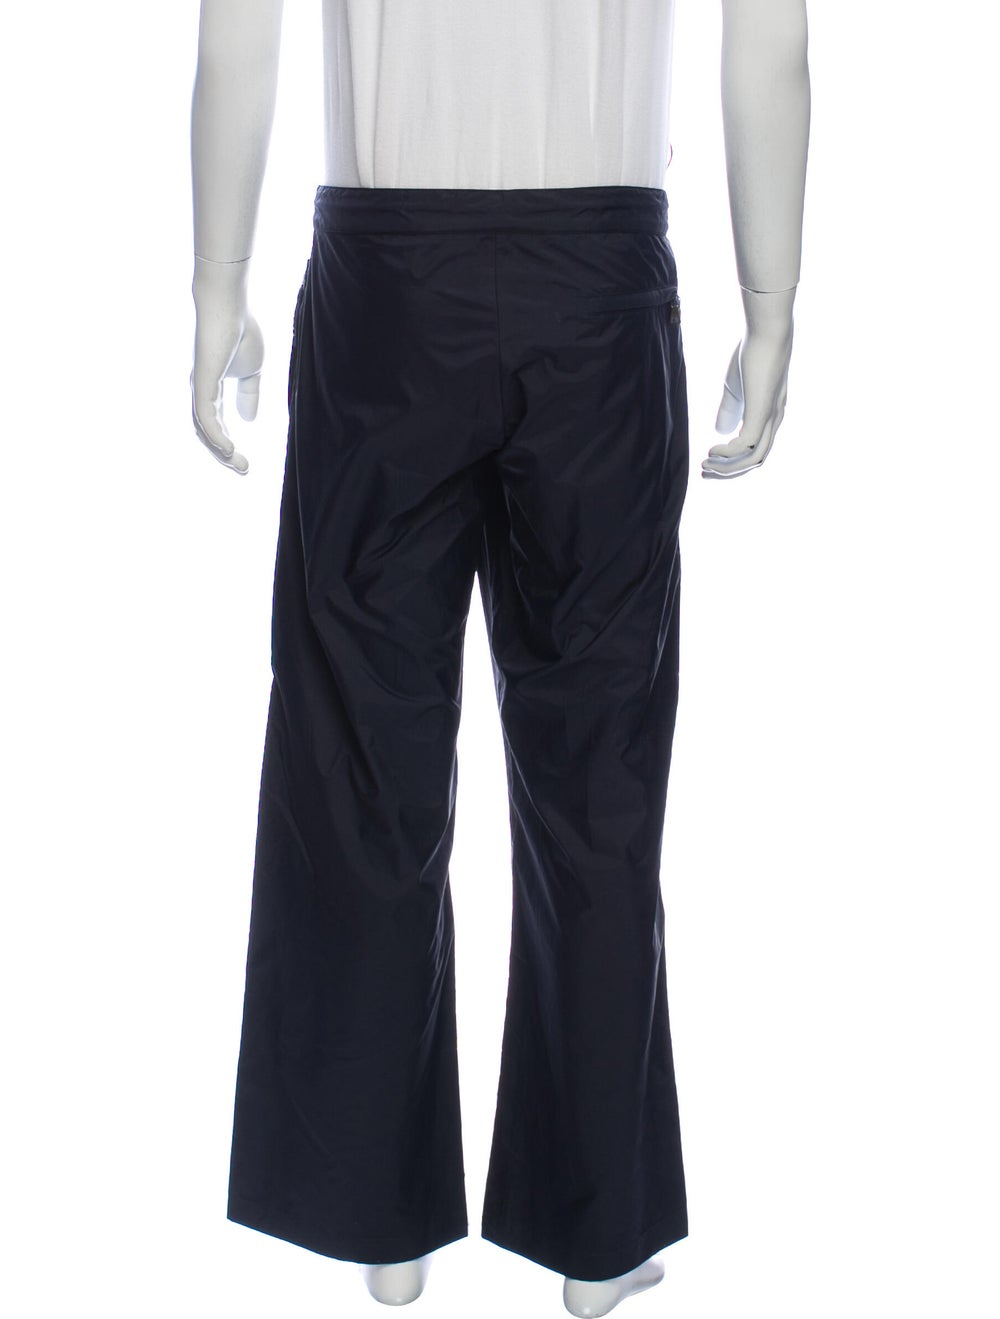 Prada Pants Blue - image 3